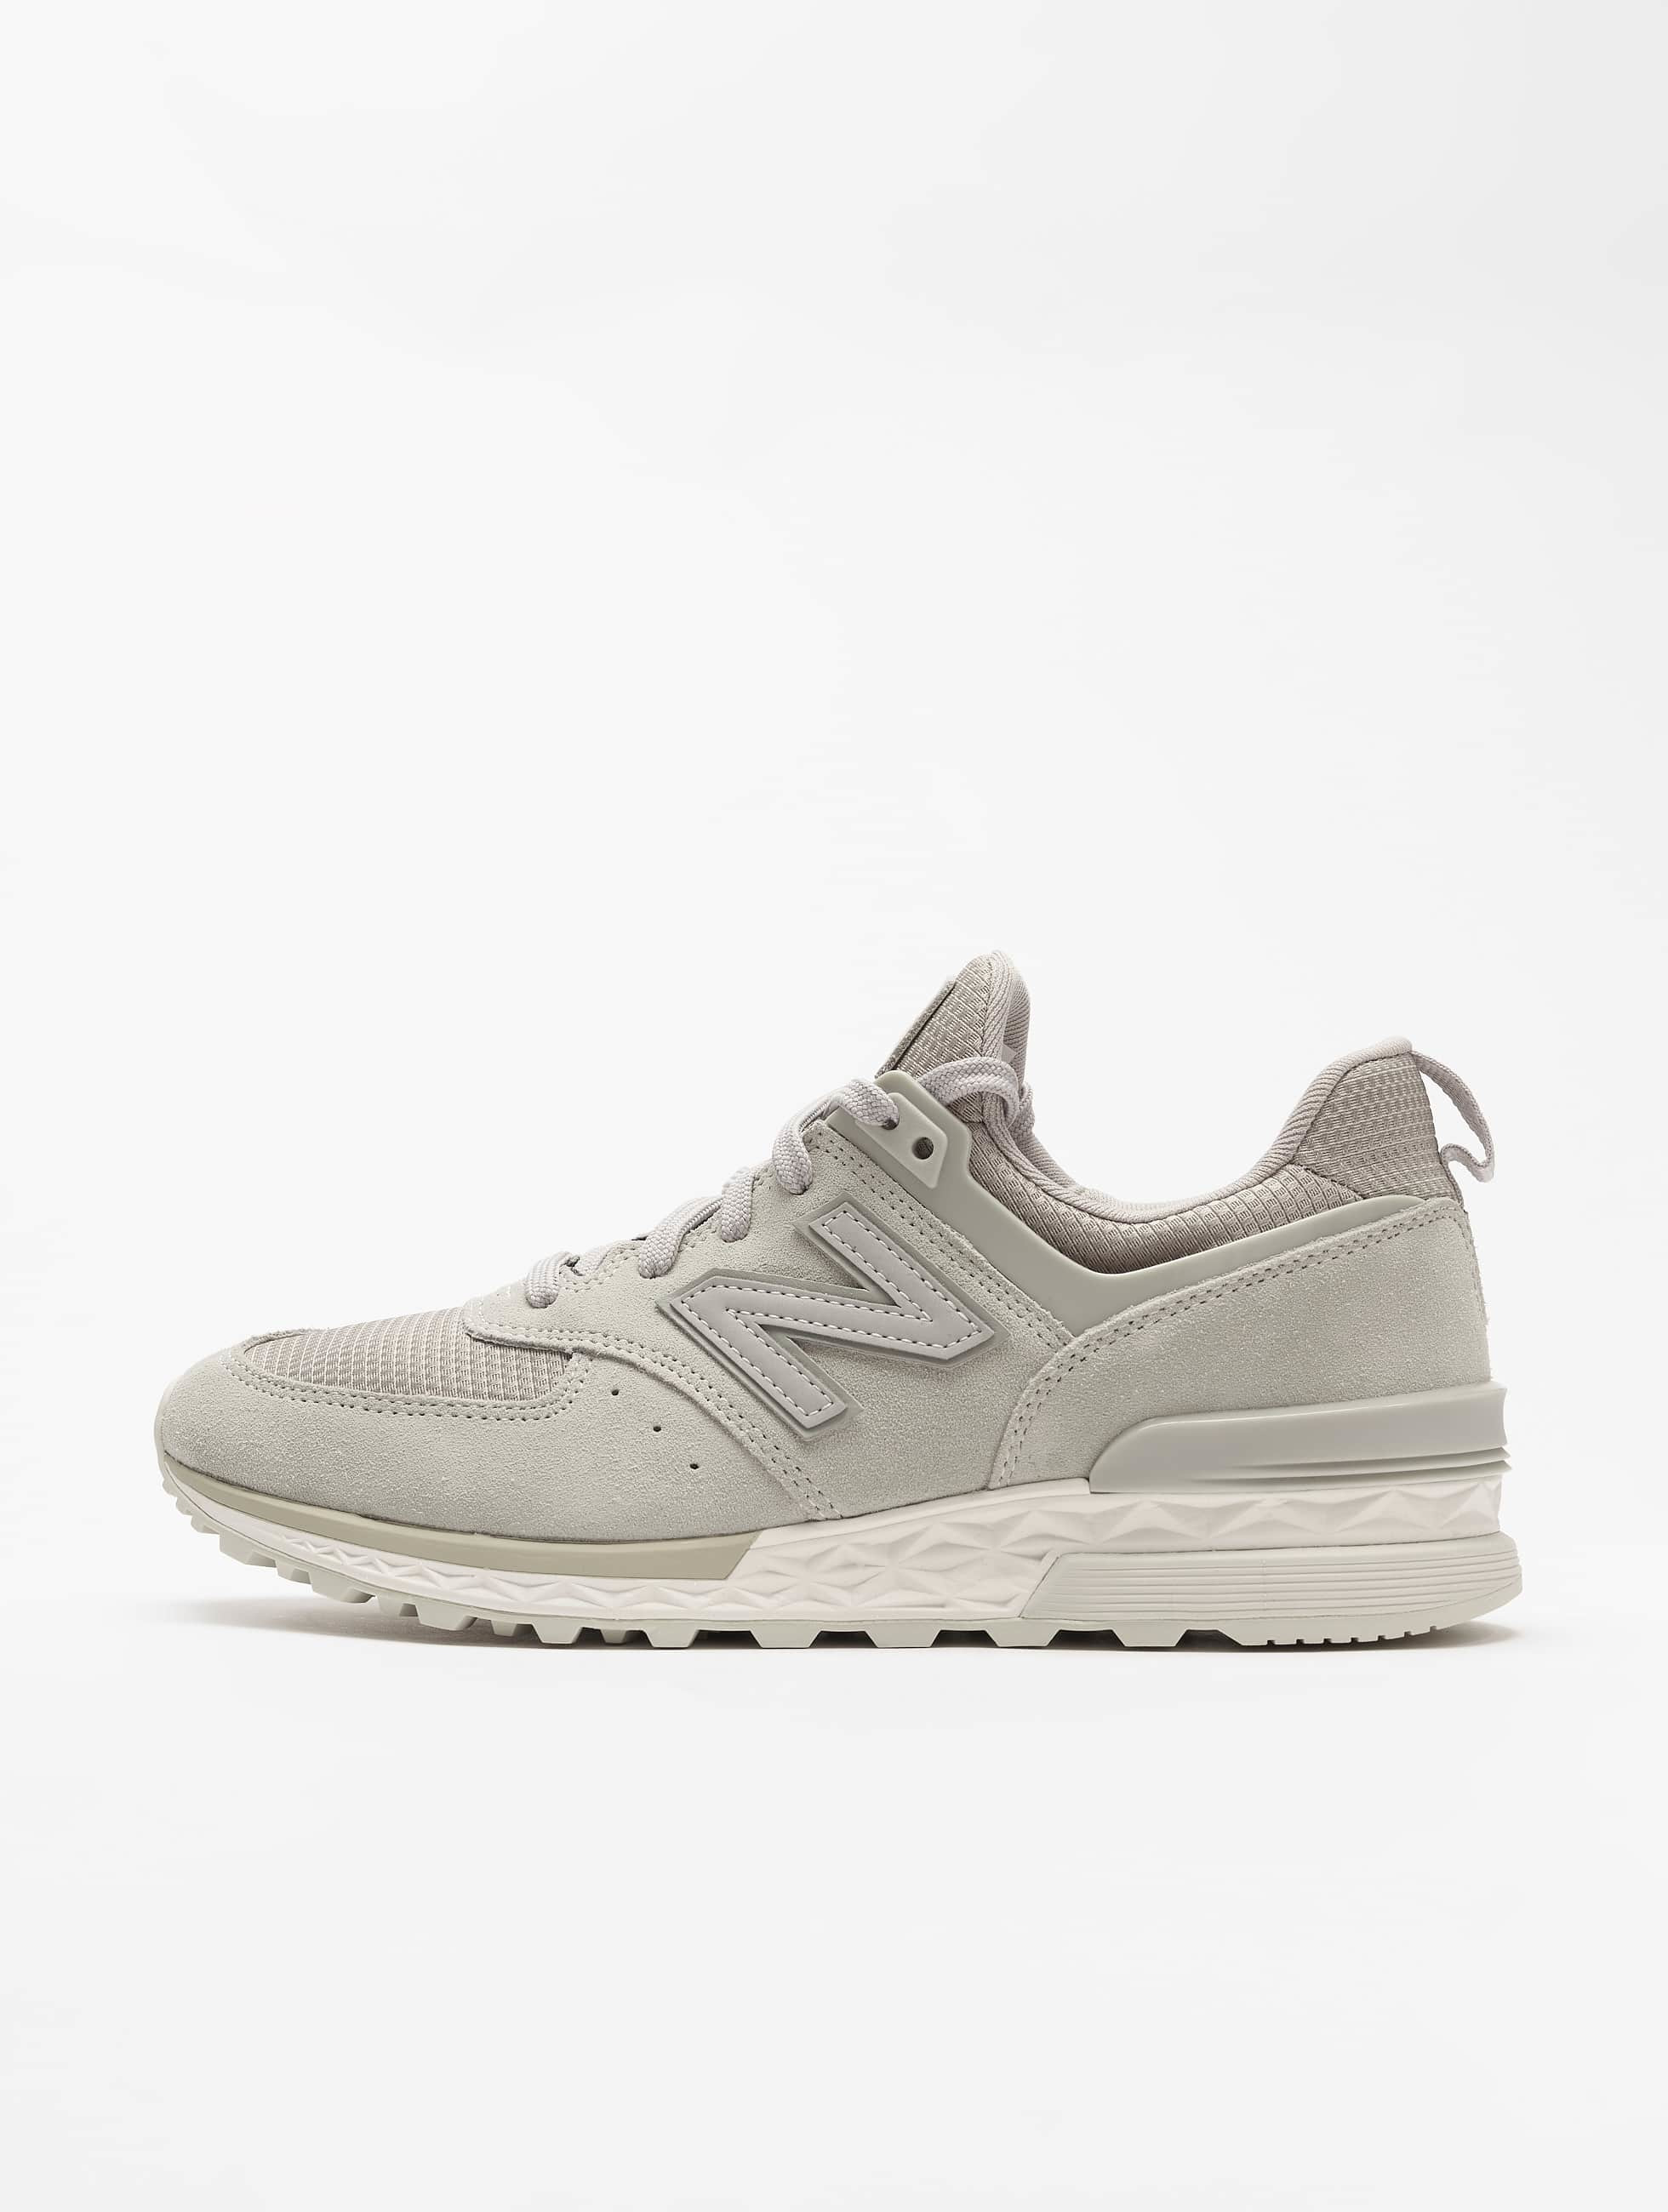 New Balance ms574fsg Gris Chaussures Femme Chaussures de